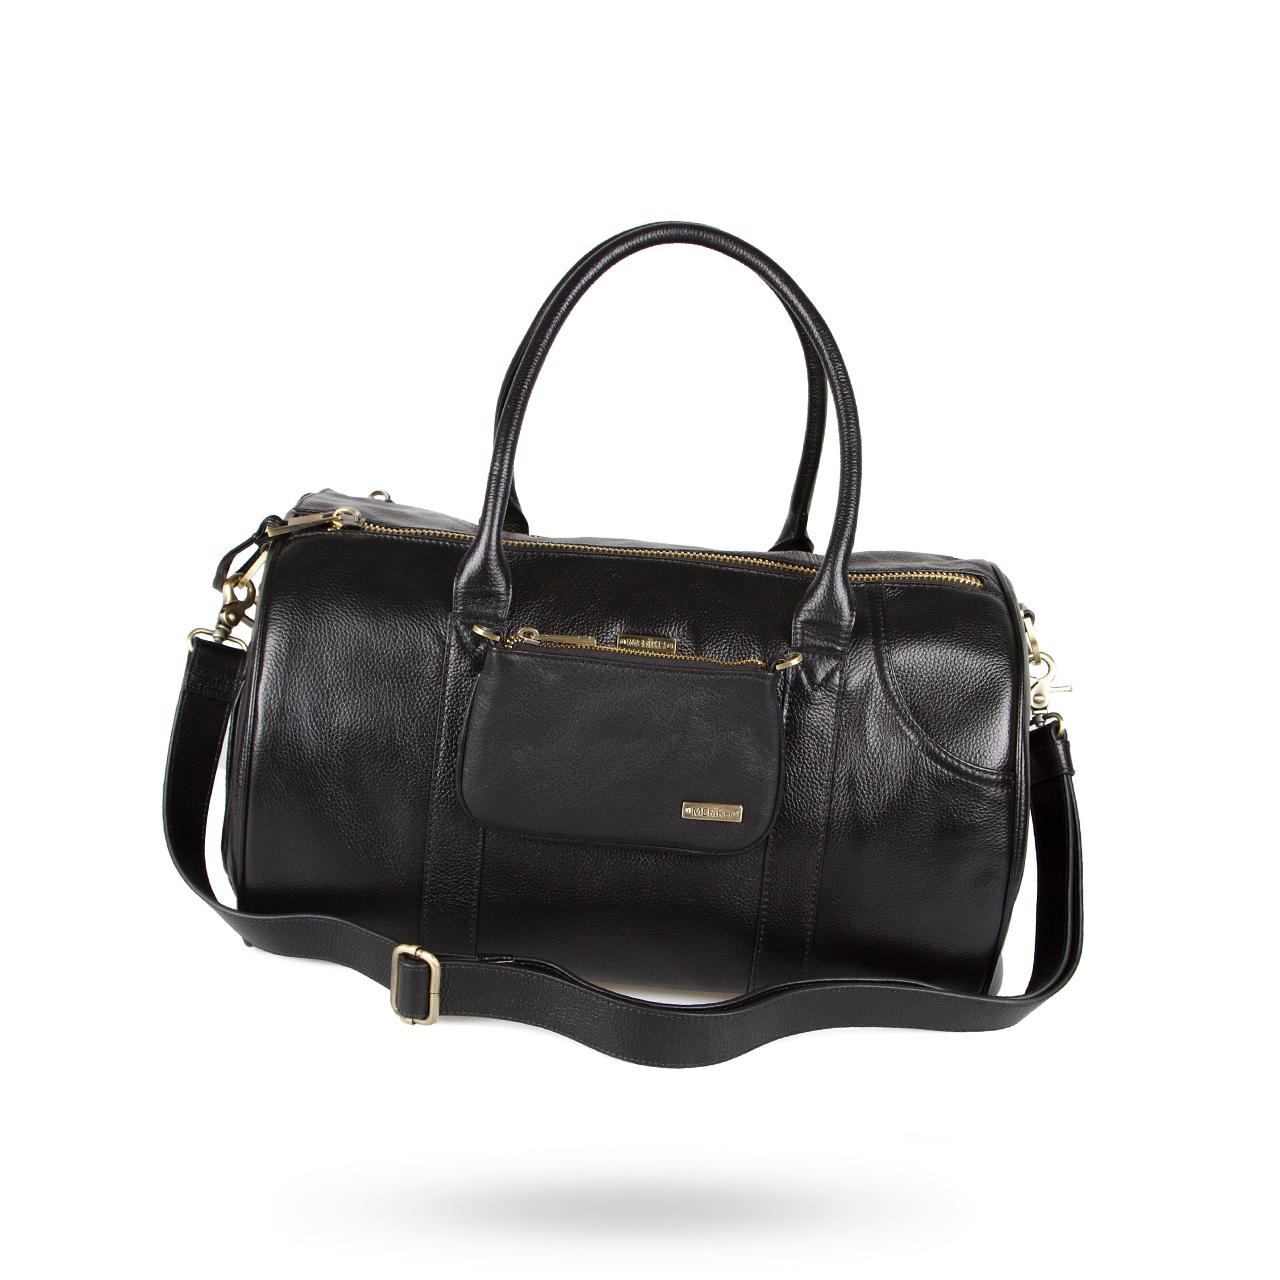 Pet Carrier Black Leather Medium